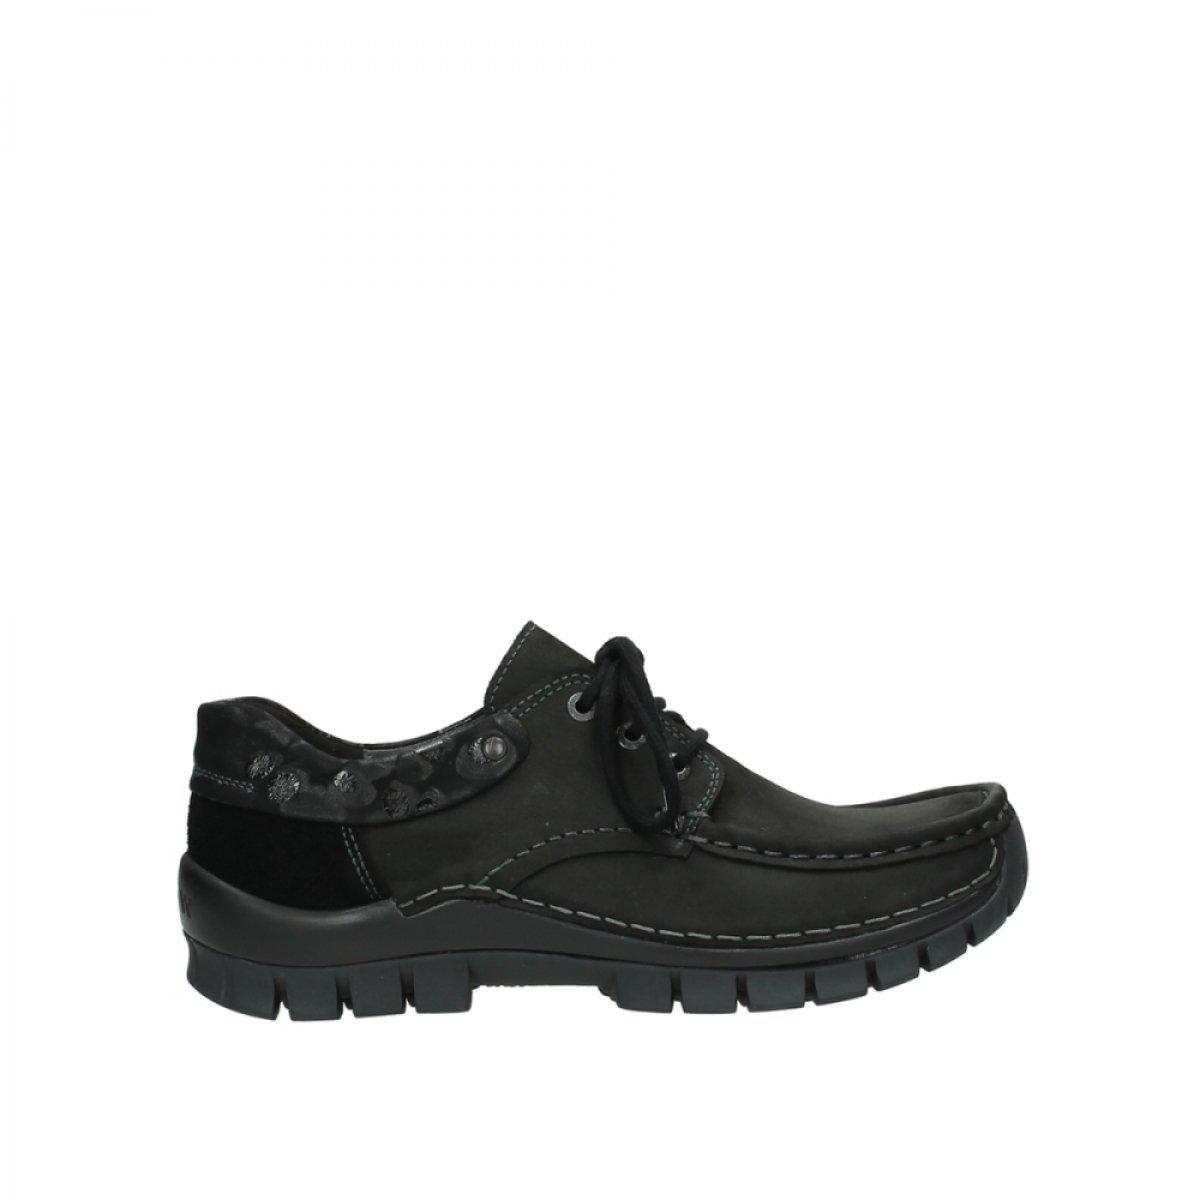 Wolky Womens Rio Leather Sandals 44 EU|59000 Schwarz Leder